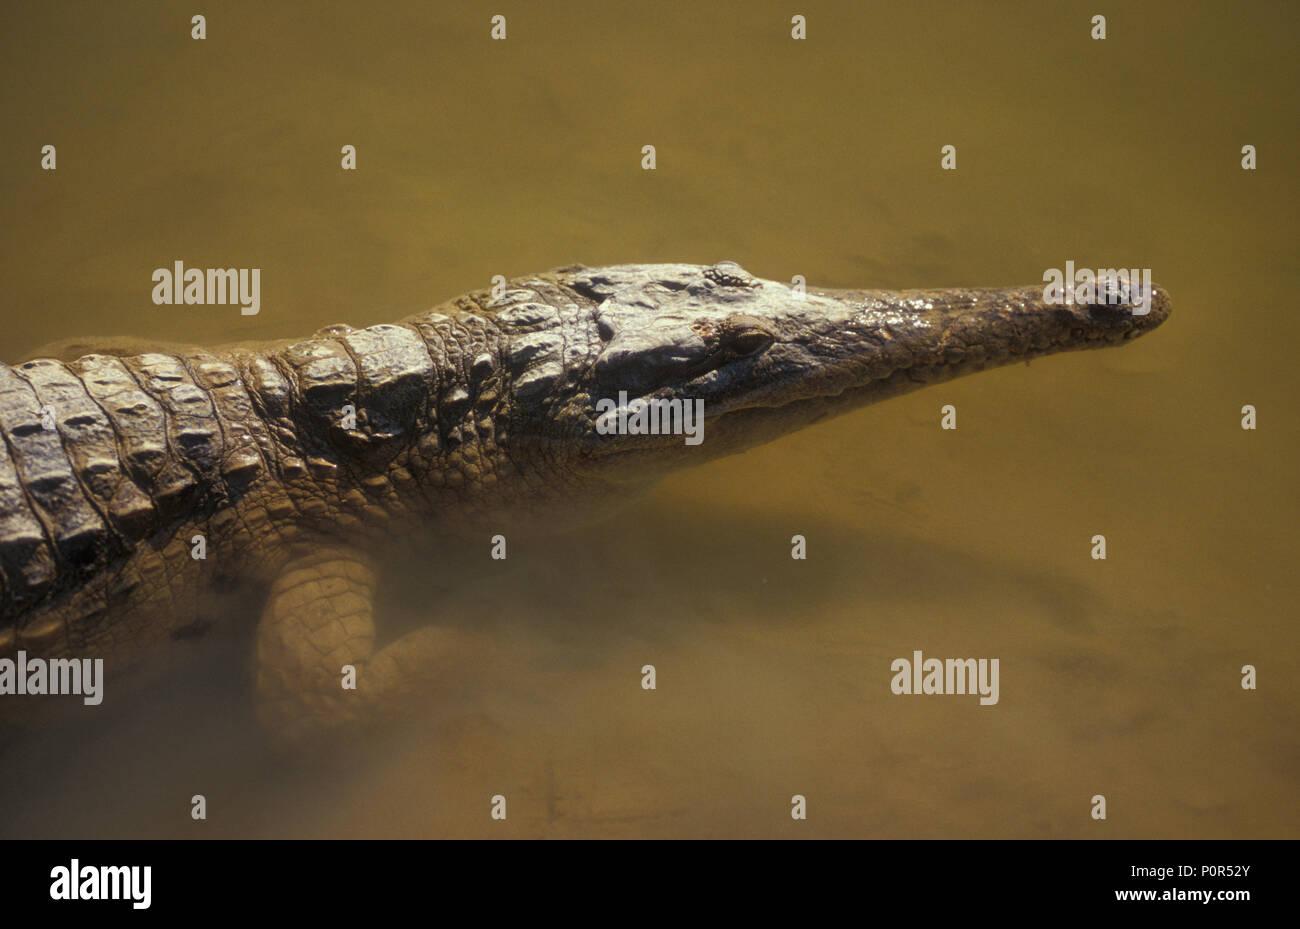 Cocodrilos de agua dulce conocida como 'FRESHIE' (Crocodylus JOHNSTONI) WINDJANA Gorge, Australia Occidental Imagen De Stock